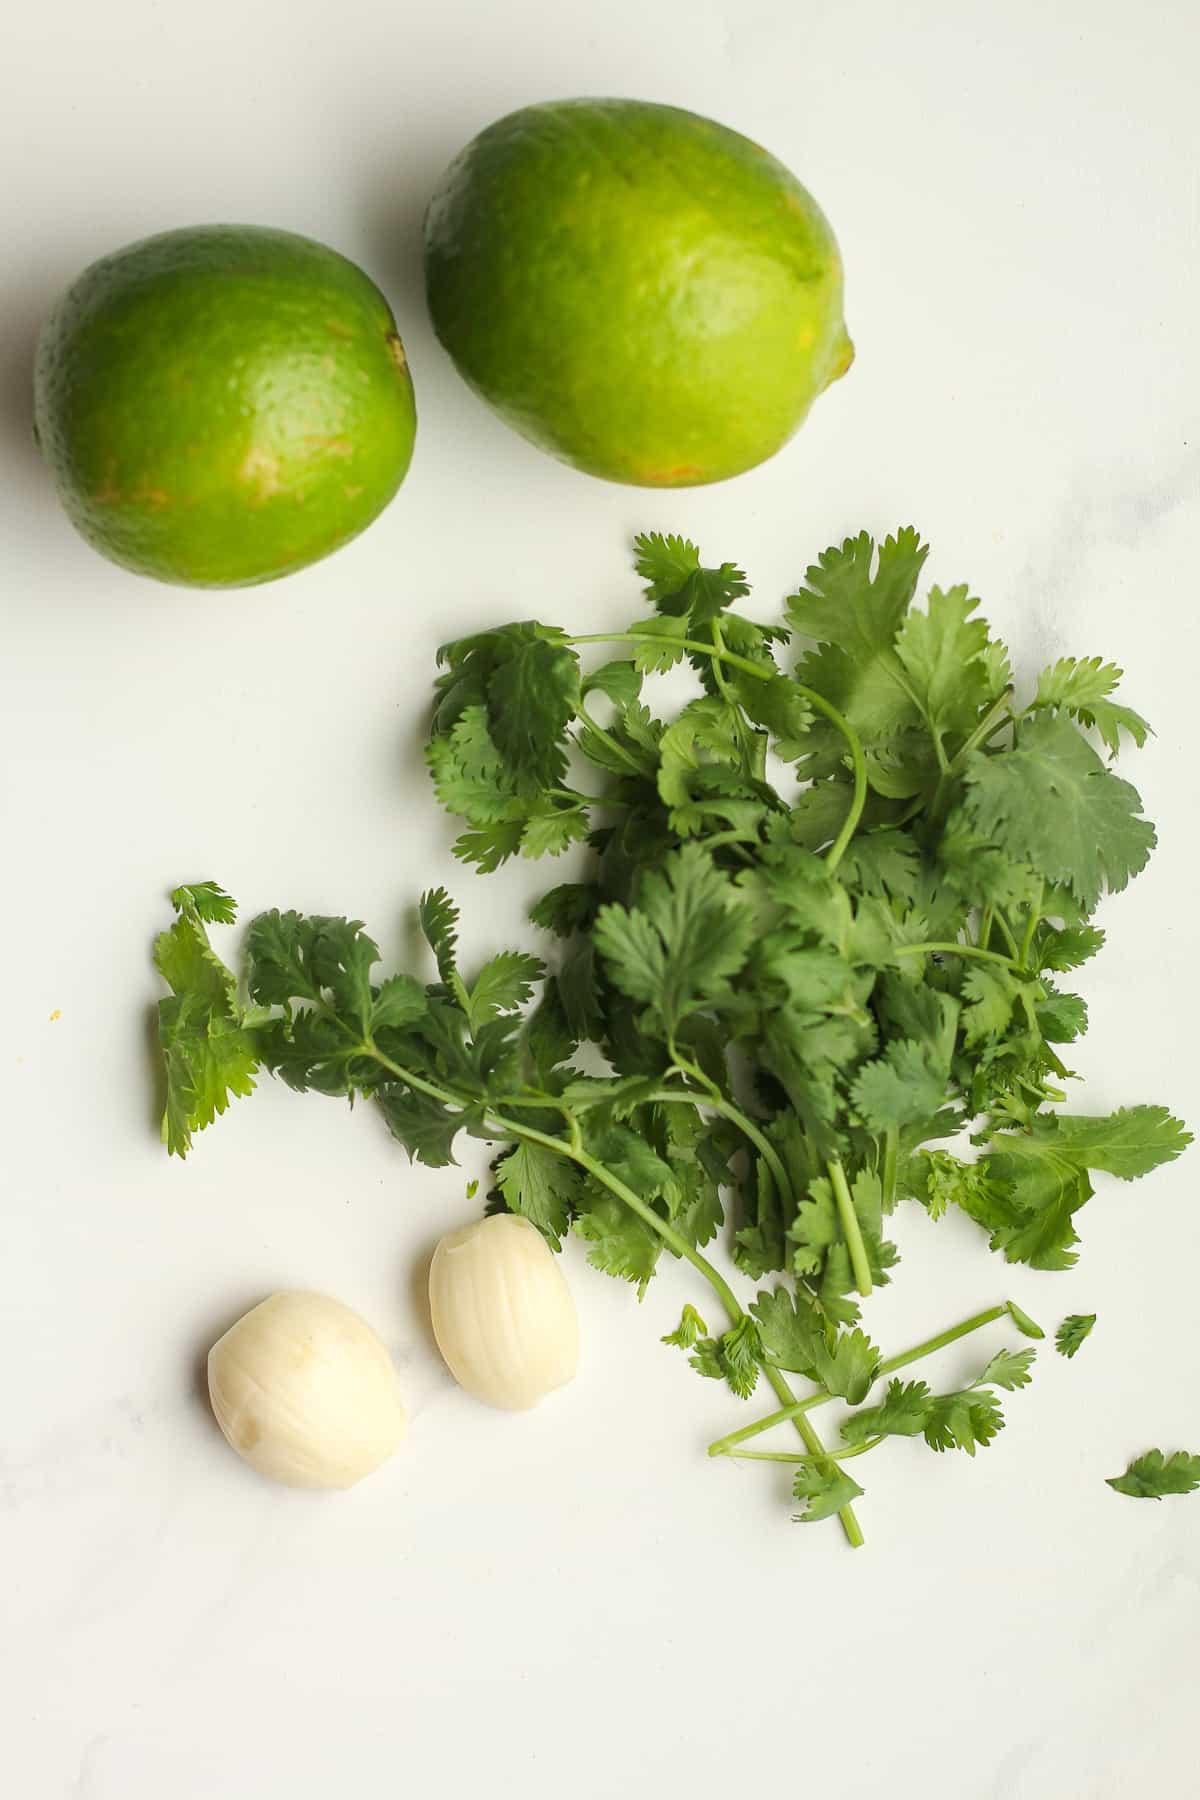 The cilantro, lime, and garlic.